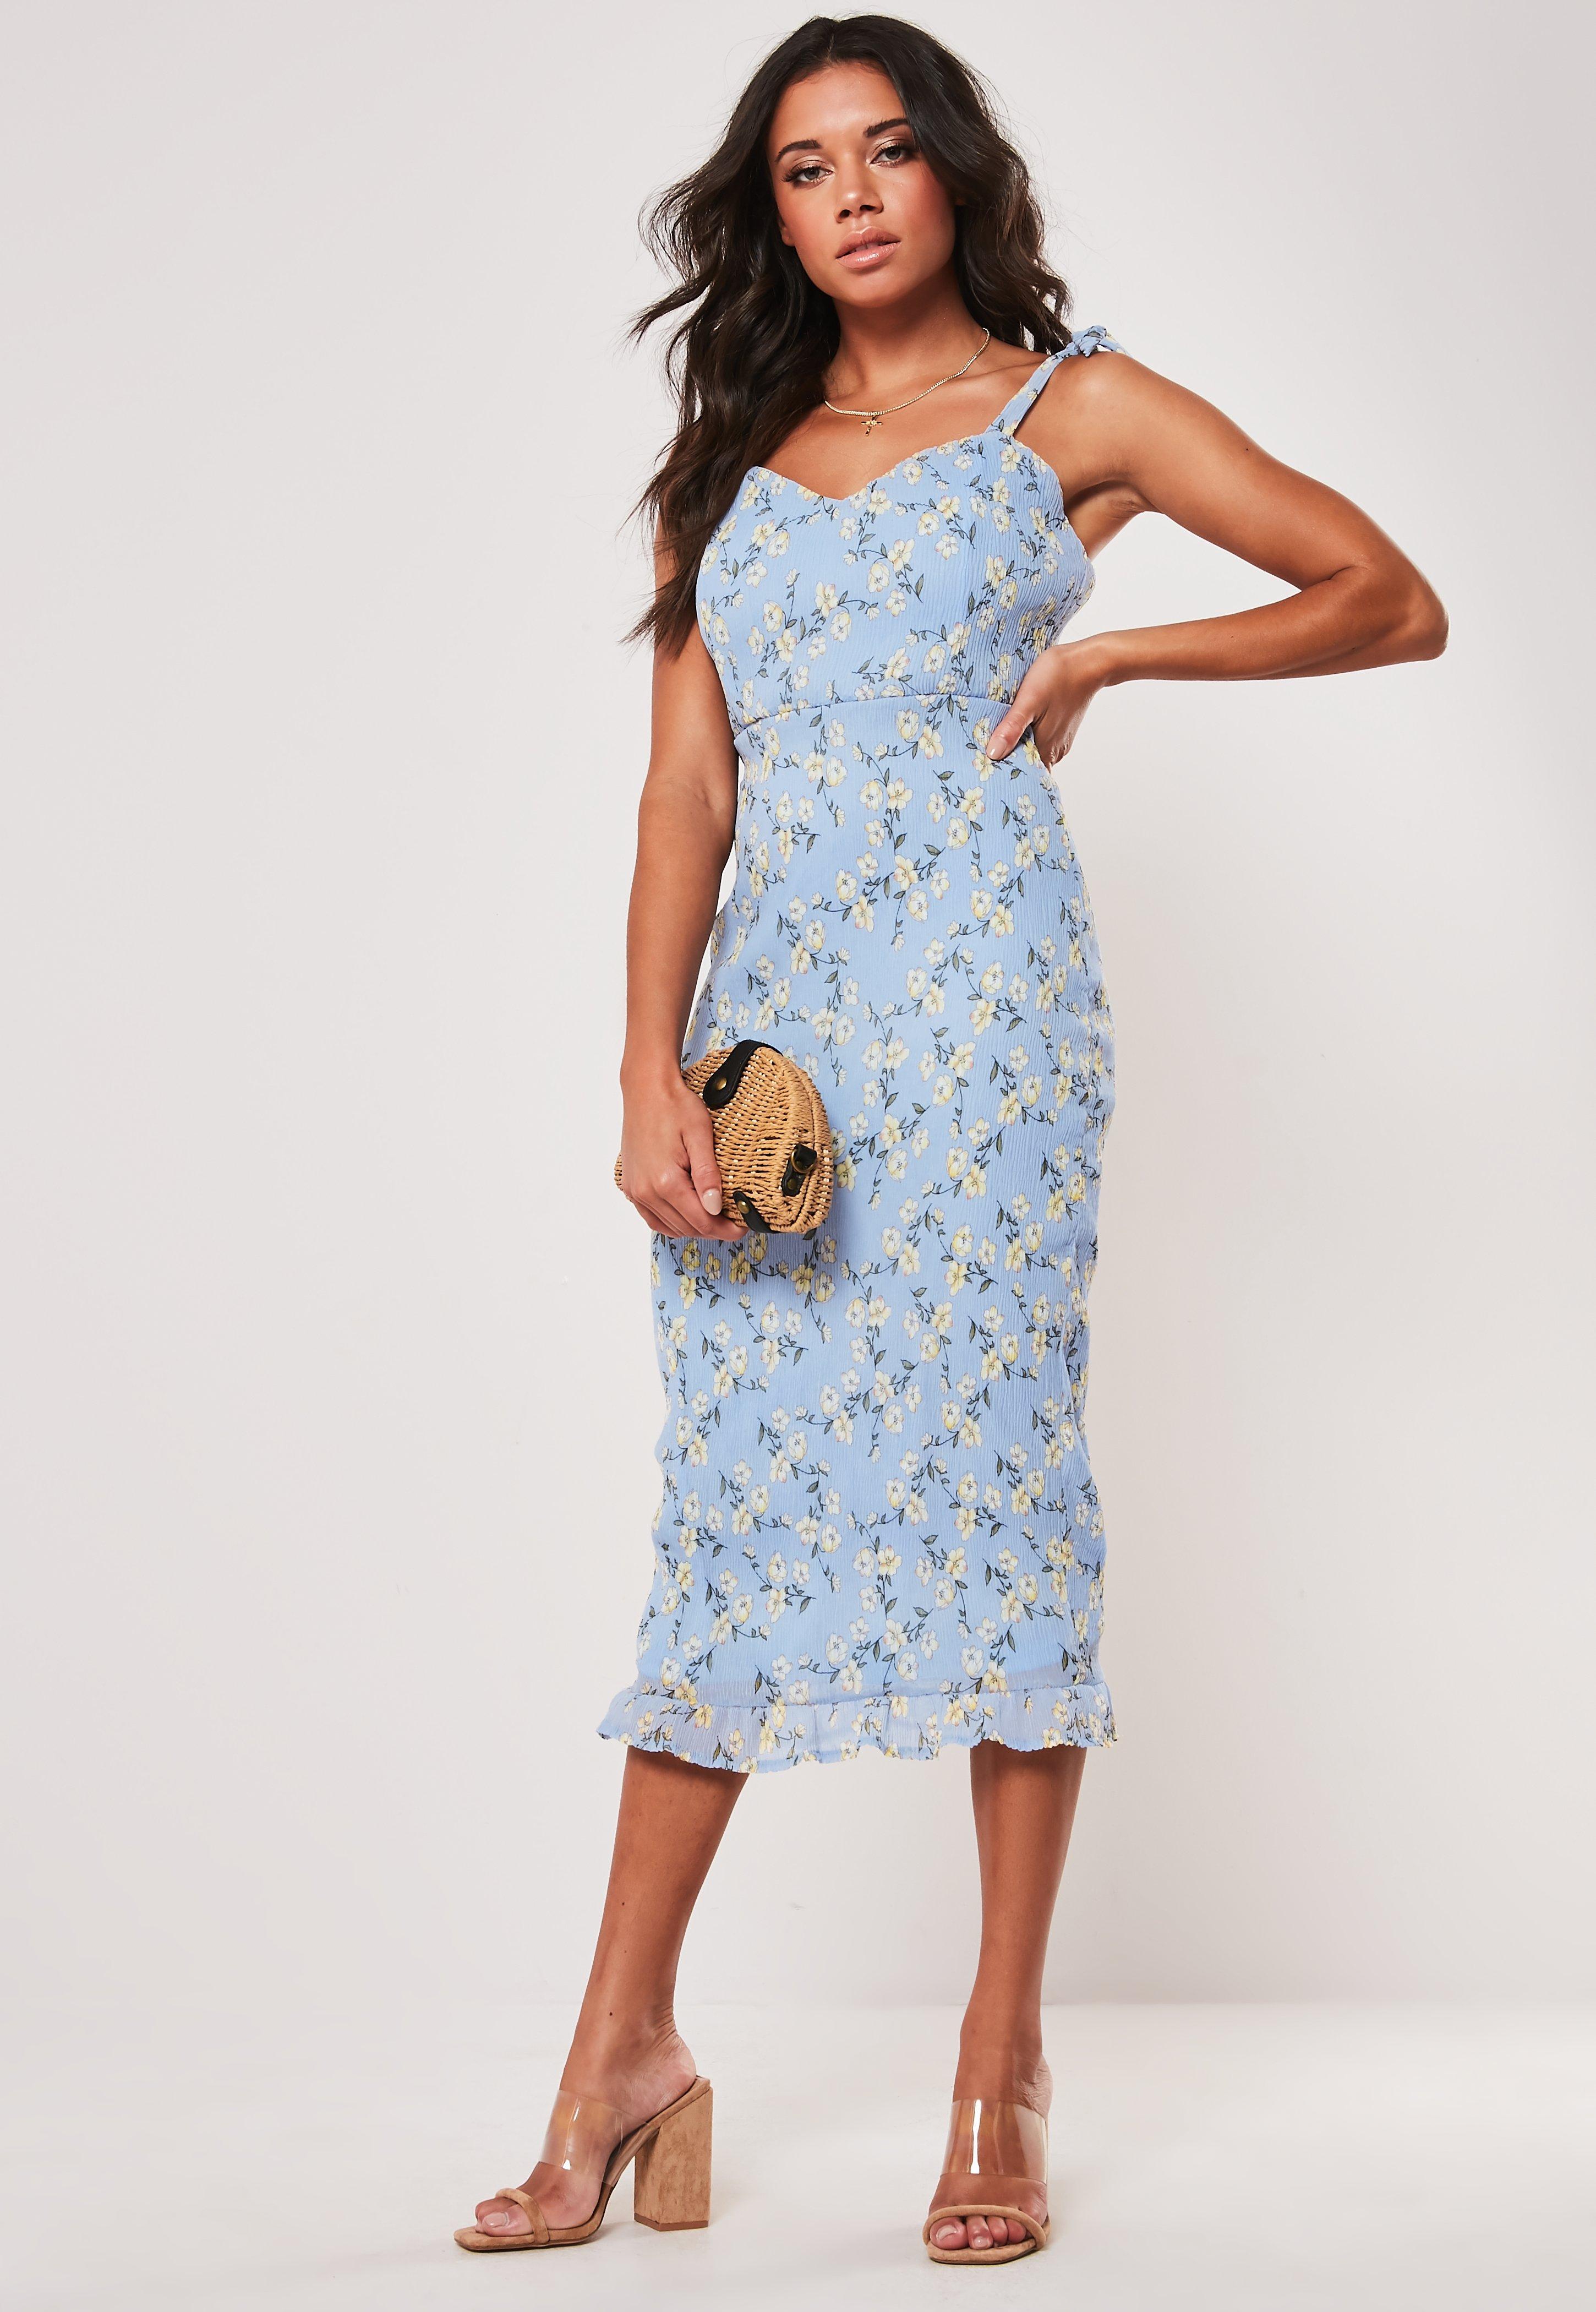 a5ee88da235d Floral Dresses | Flower Print Dresses - Missguided